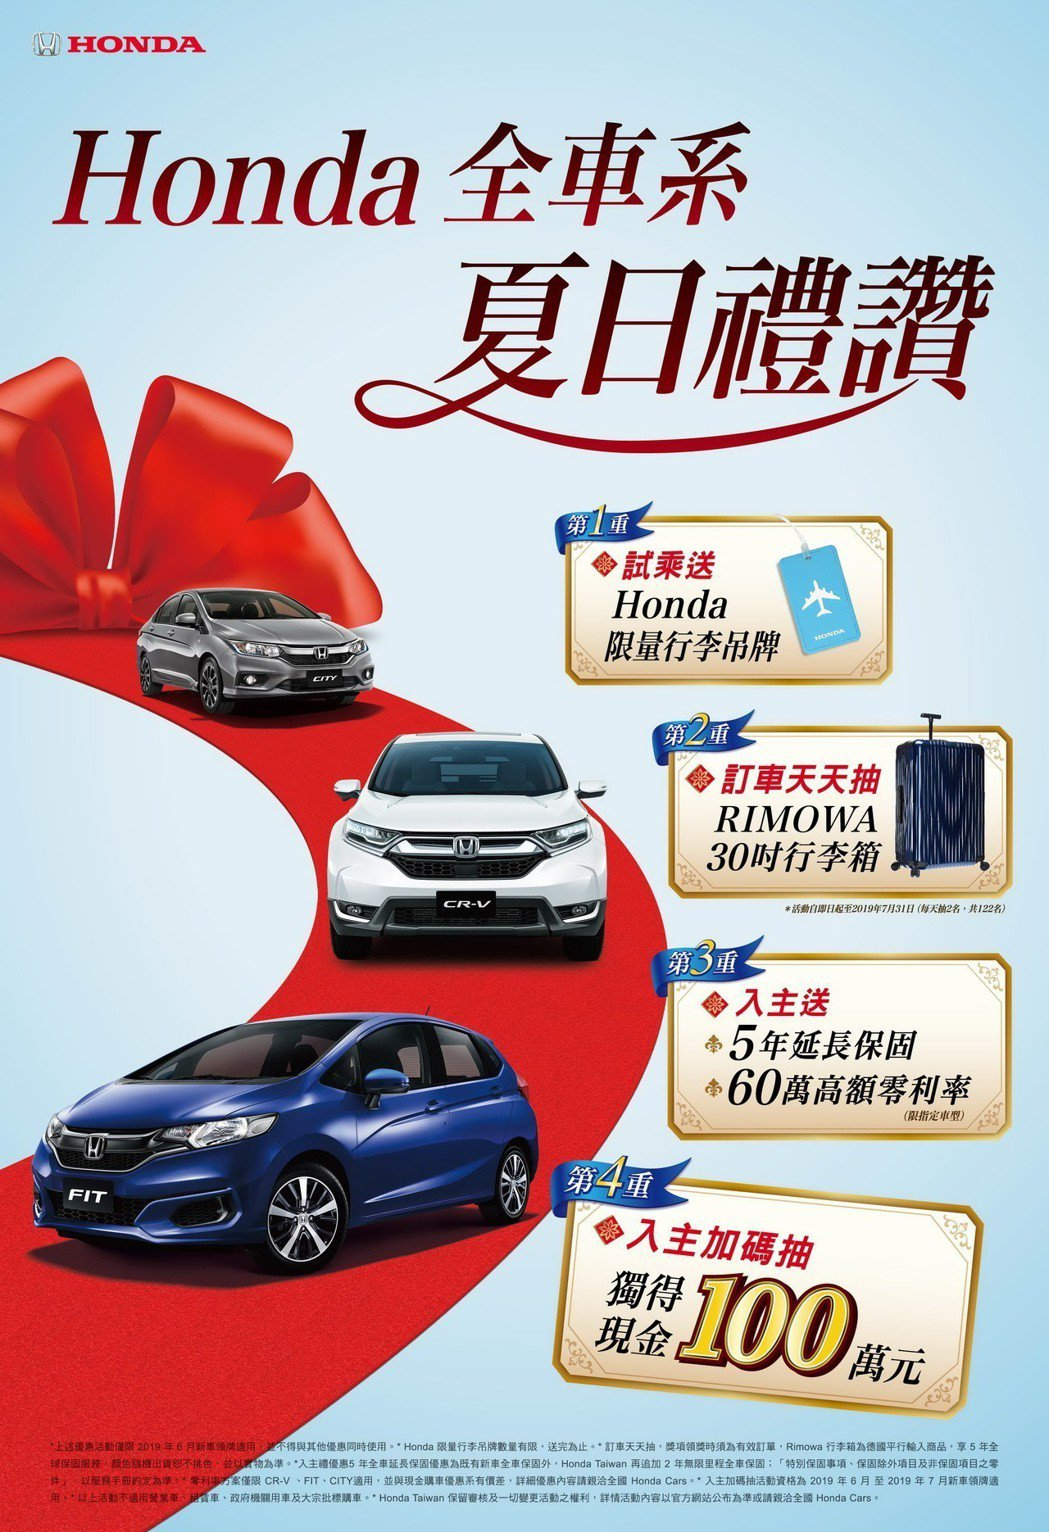 Honda全車系夏日禮讚。 圖/Honda Taiwan提供